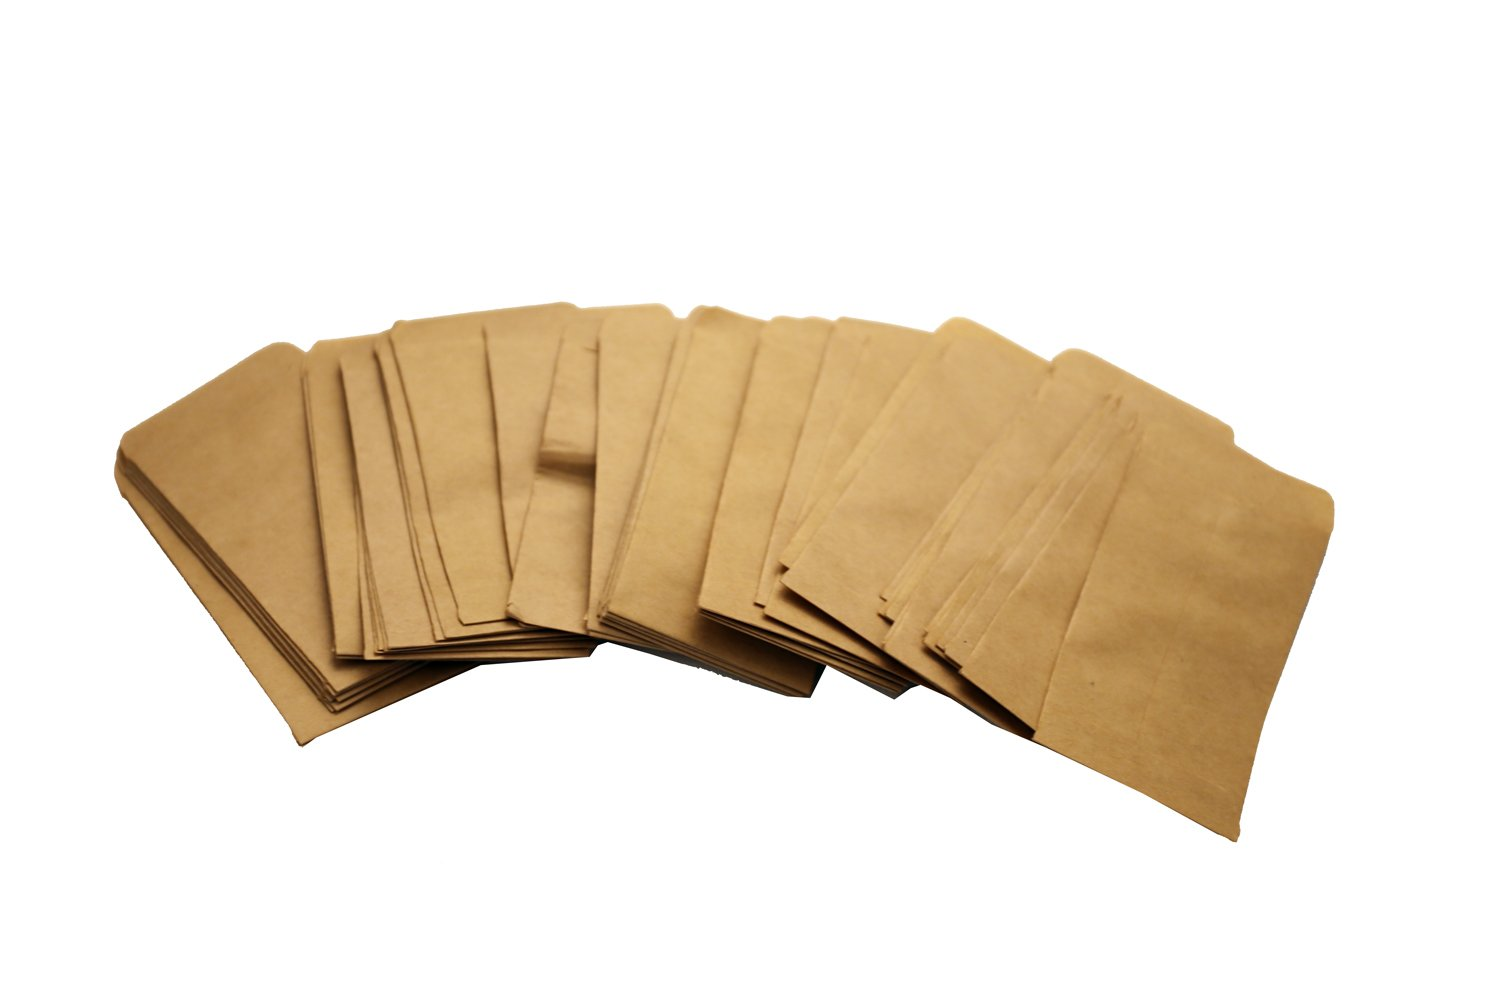 Walkingpround 100 Pieces Vintage Hybrid Seed Envelopes Blank Kraft Paper Brown Seed Bags Tobacco Seeds Corn Farm Bag (2.36'' x 3.93'')